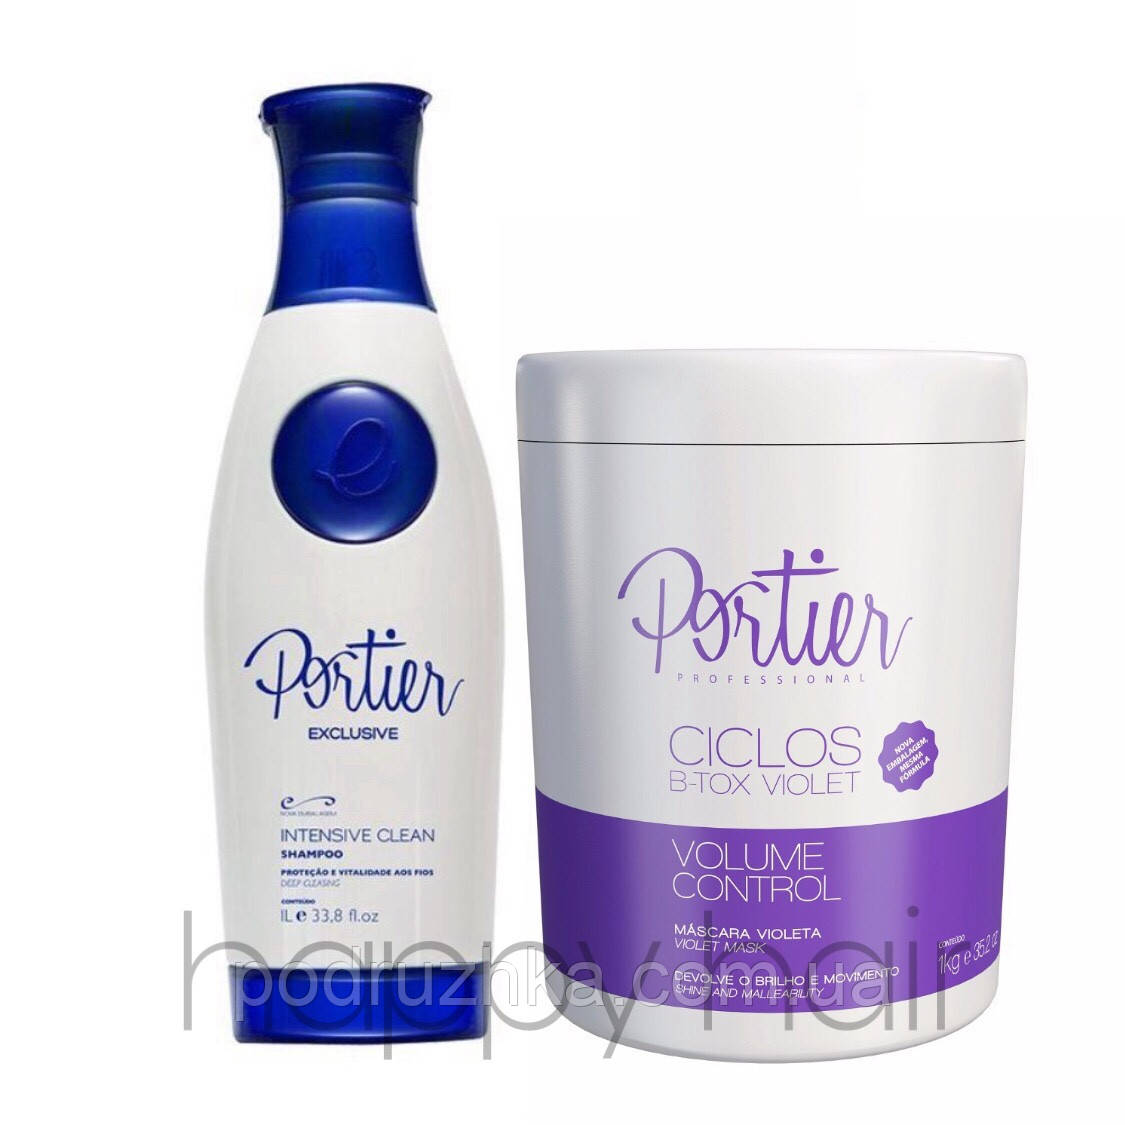 Portier Ciclos Violet B-TOX Маsk Набор ботекс для волос 2х1000 г